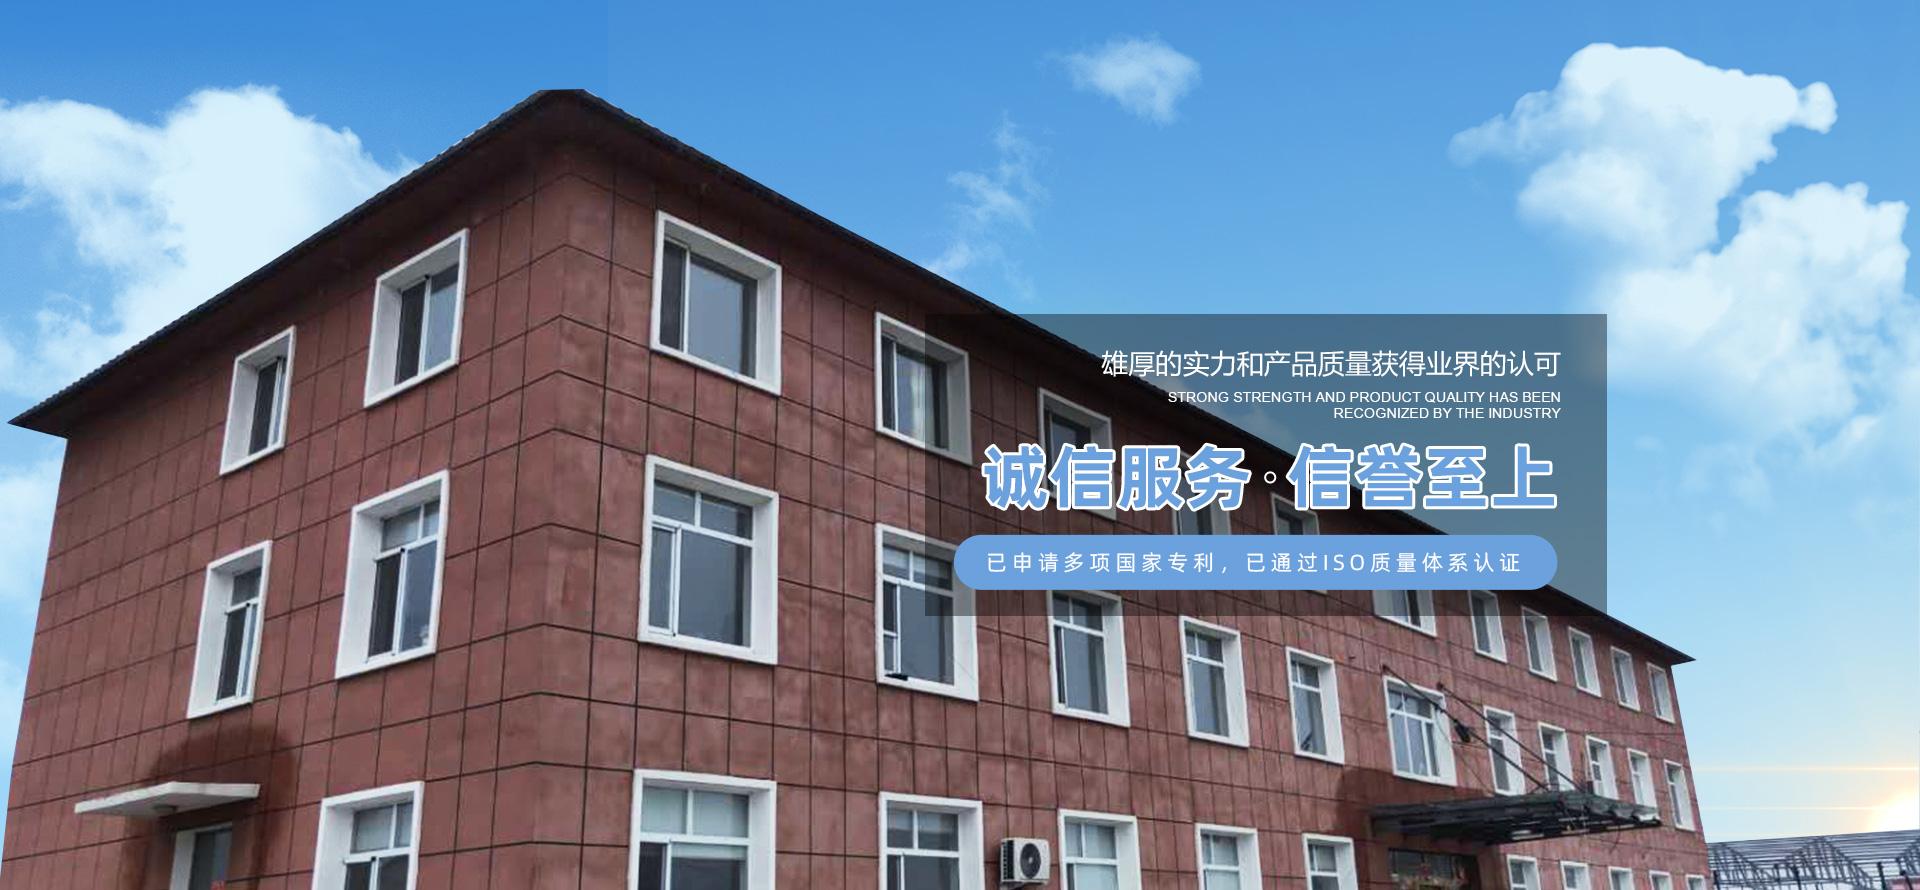 http://www.syhwsy.cn/data/upload/202109/20210916134218_402.jpg